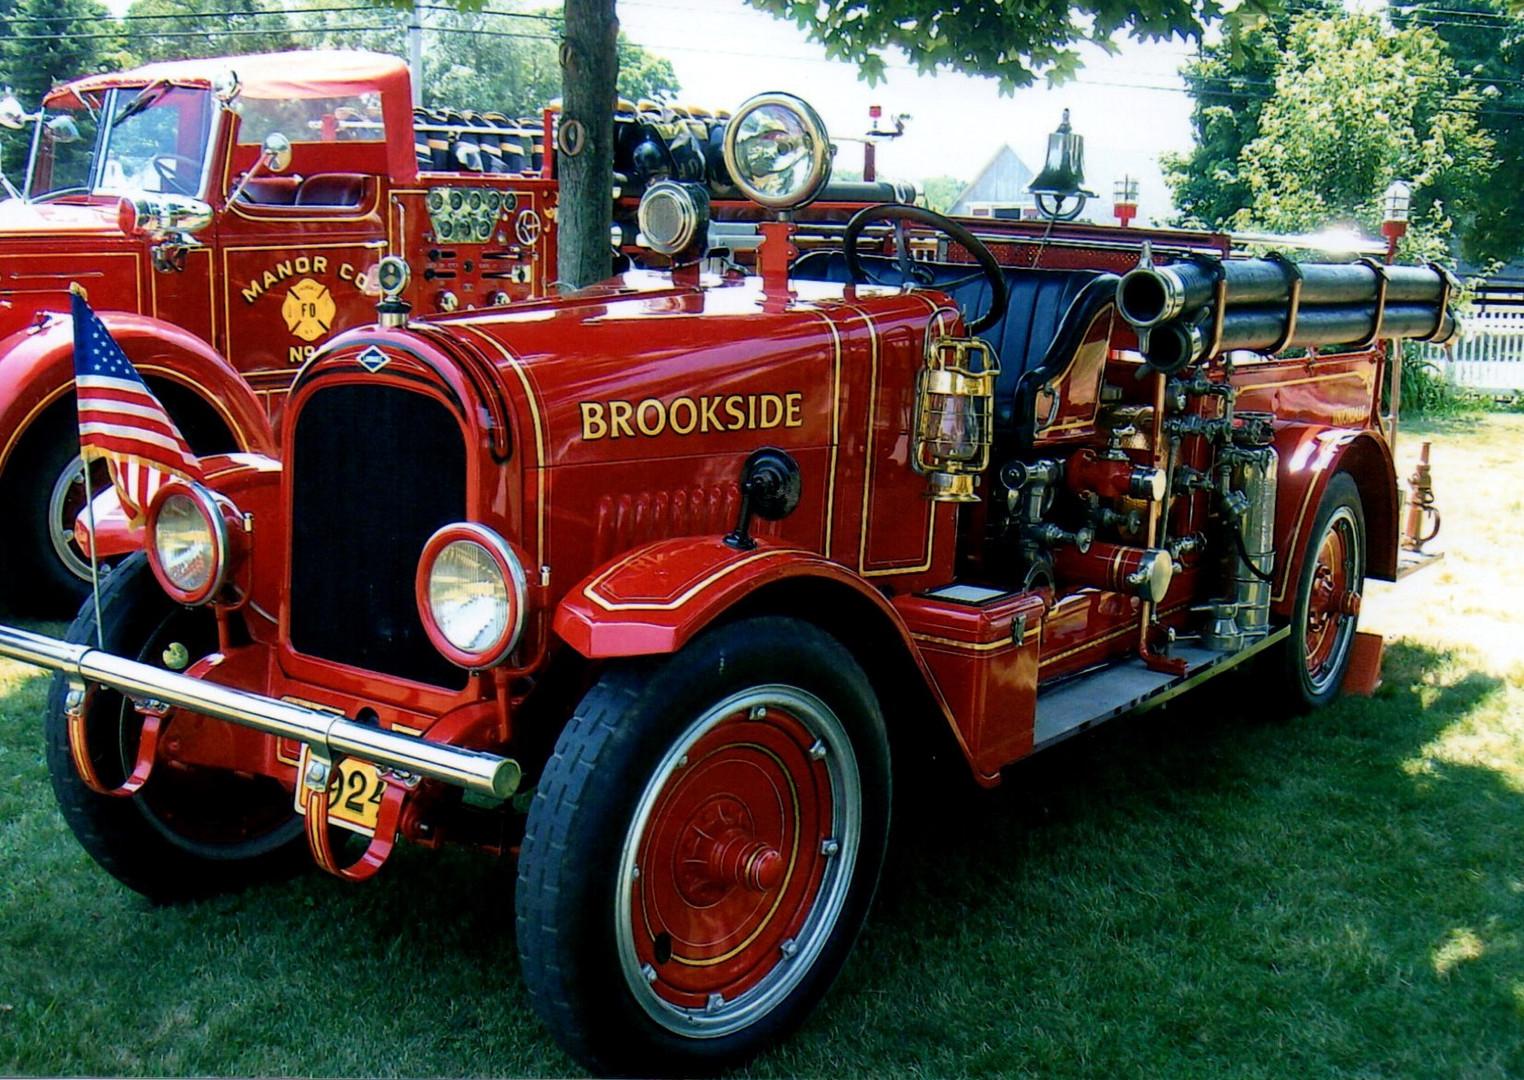 1924 Larabee pumper - Uniondale F.D.